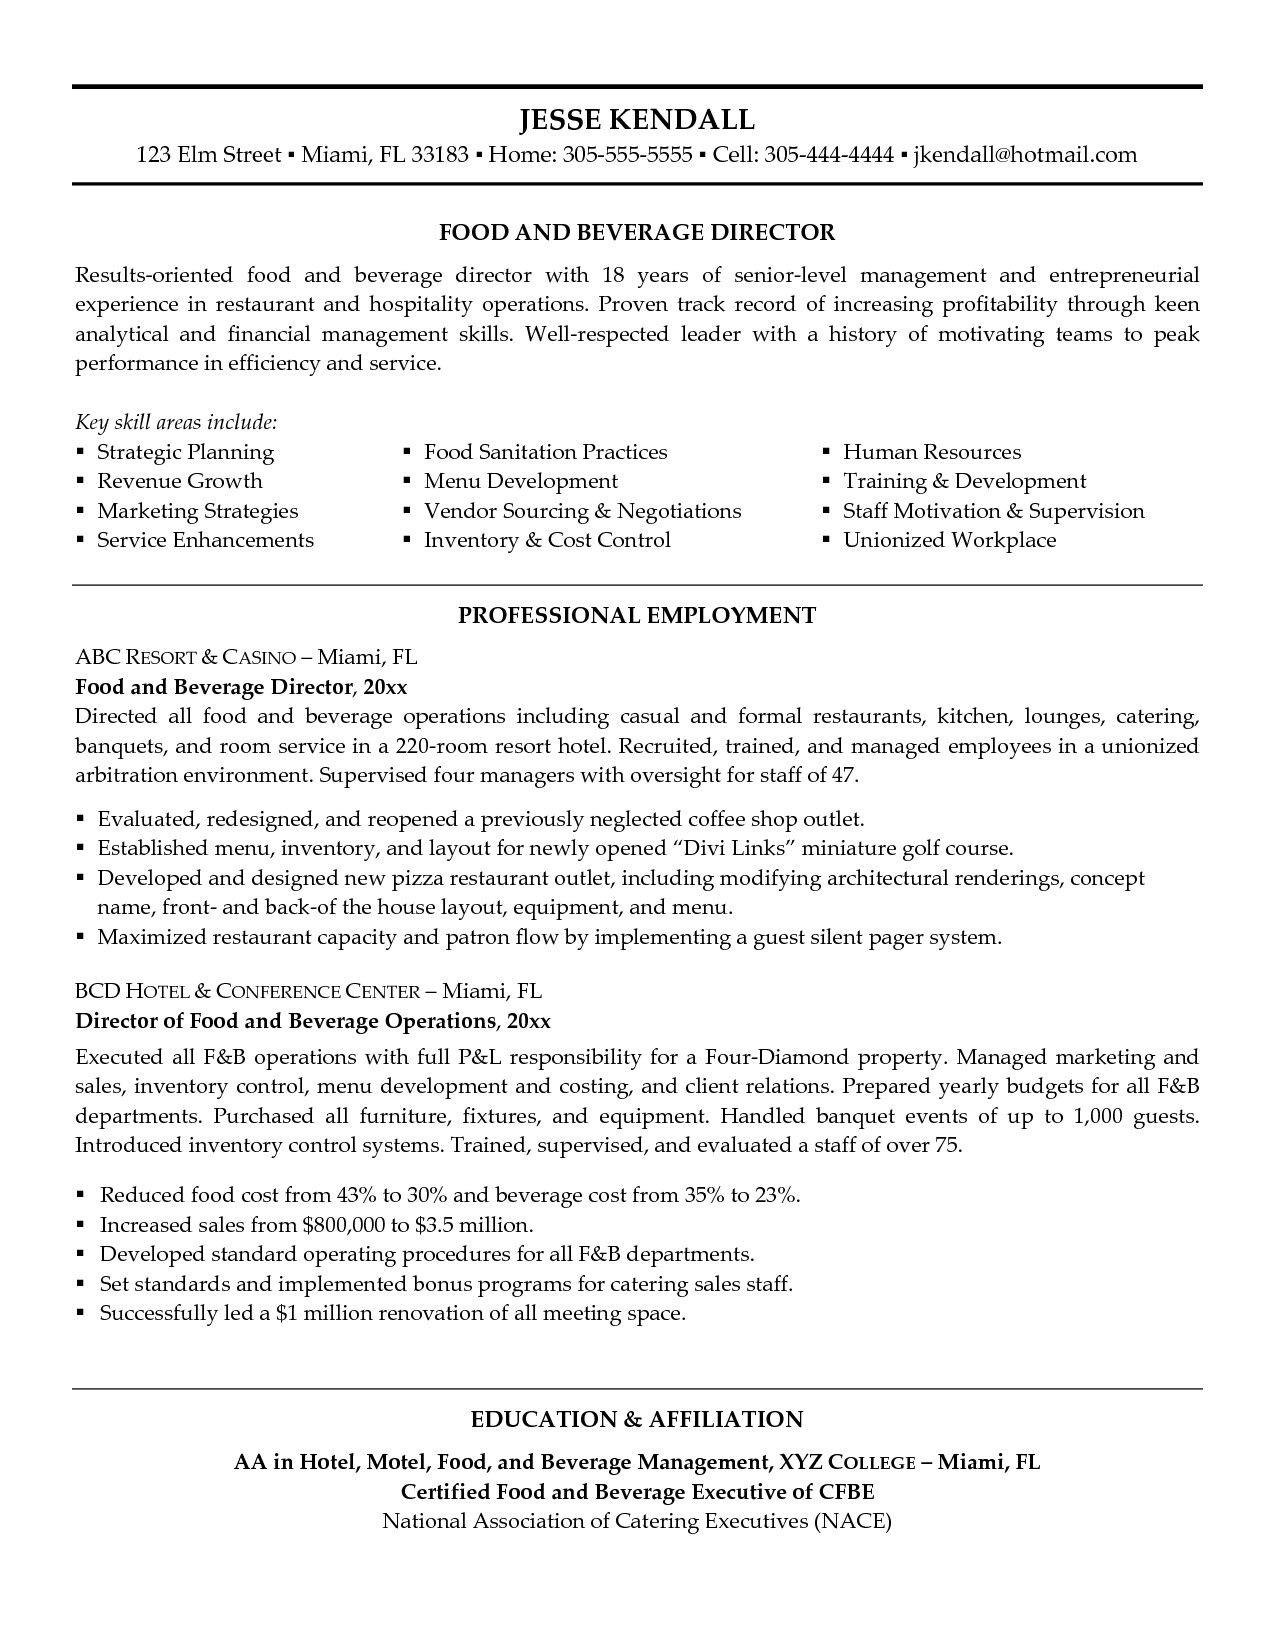 Food And Beverage Manager Resume Modern Food And Beverage Manager Resume Of 35 Interesting Fo Resume Cover Letter Examples Manager Resume Management